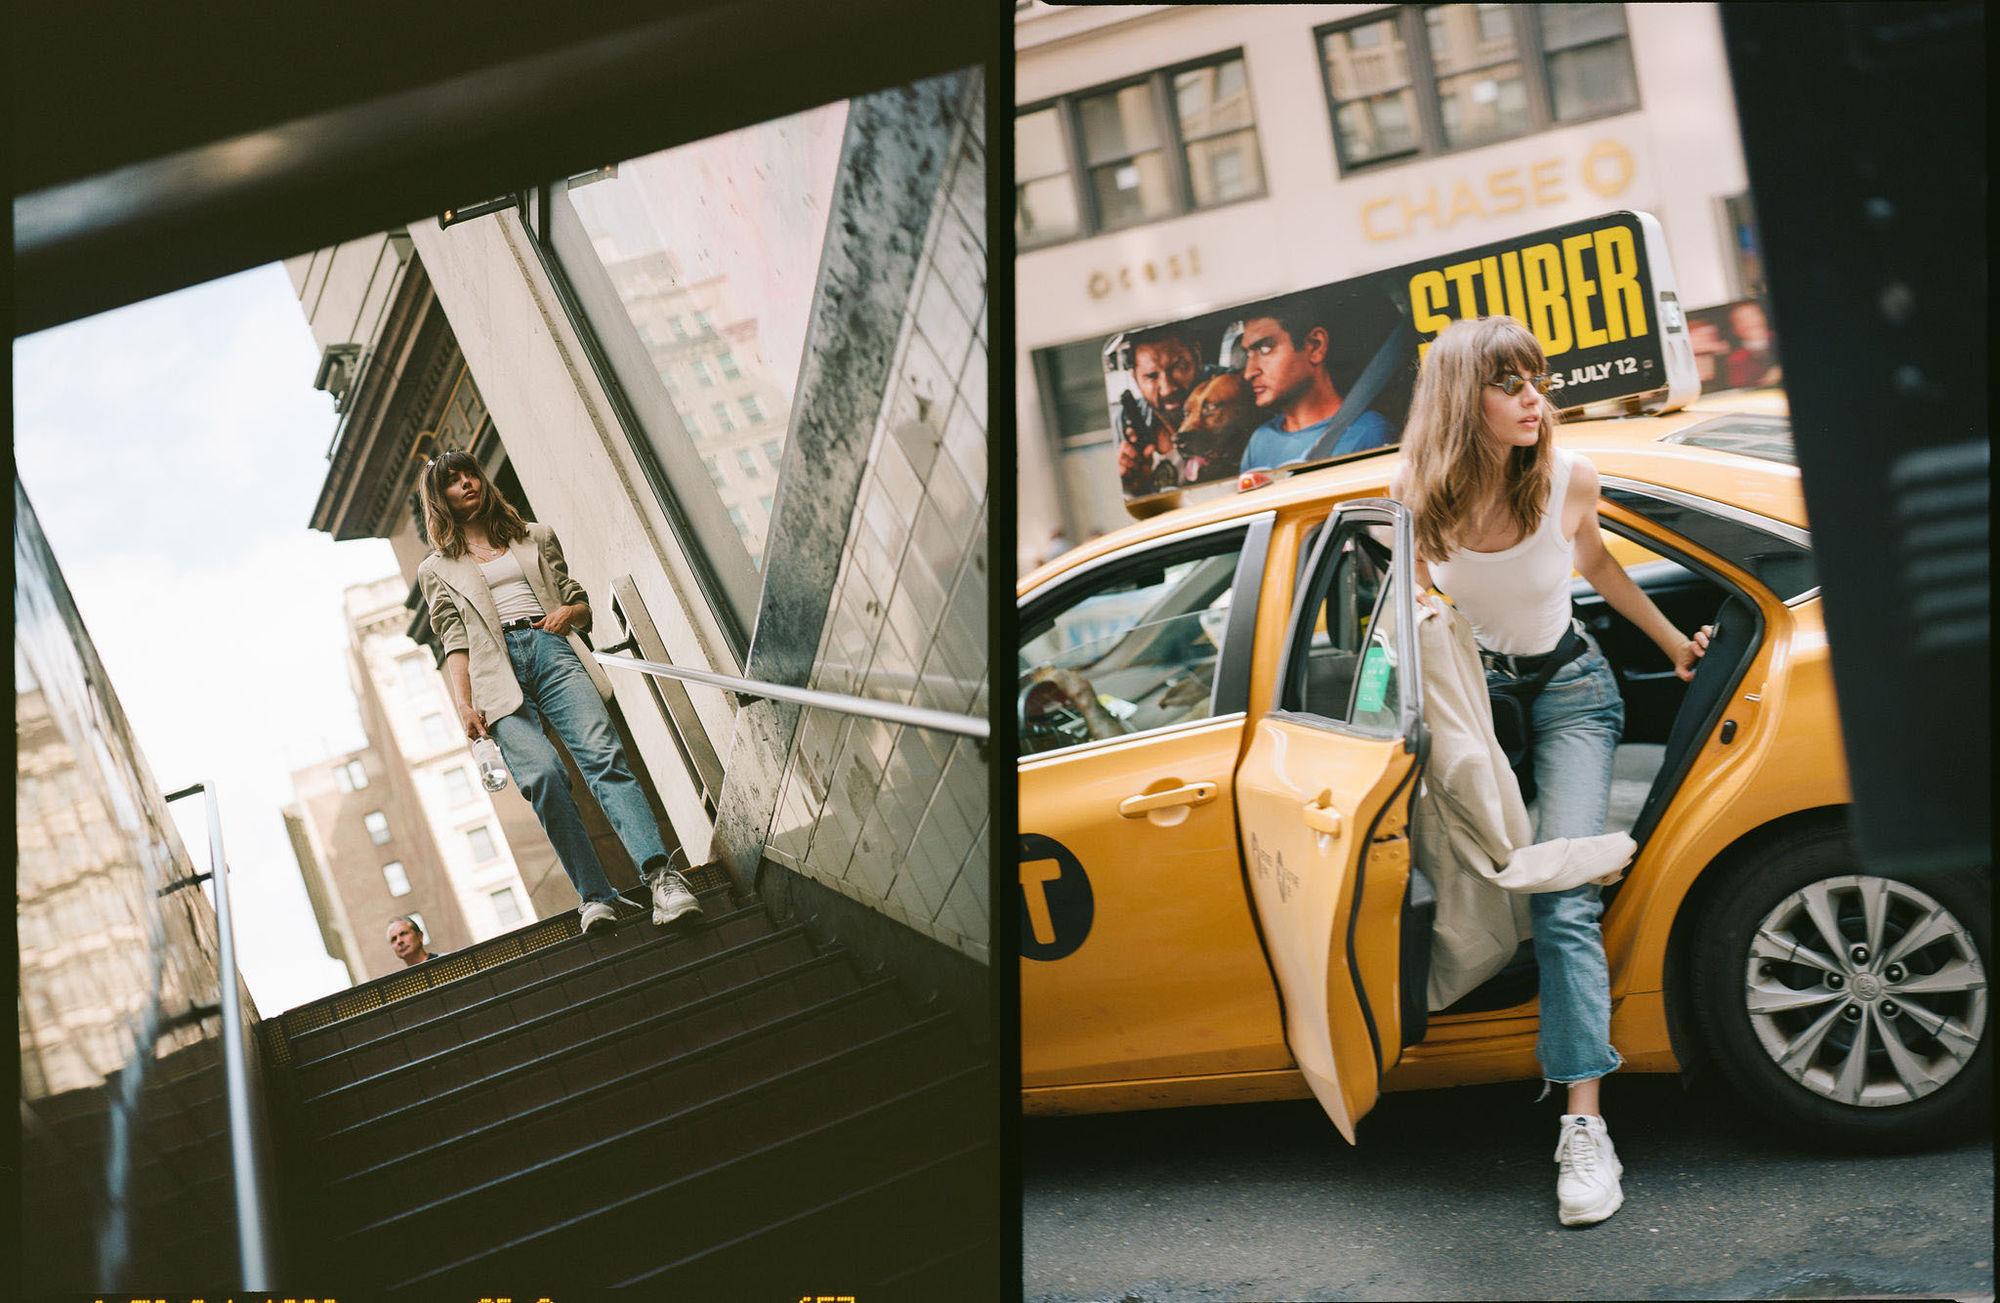 ALYSSA PIZER MANAGEMENT: NY Girl By Vivian Kim